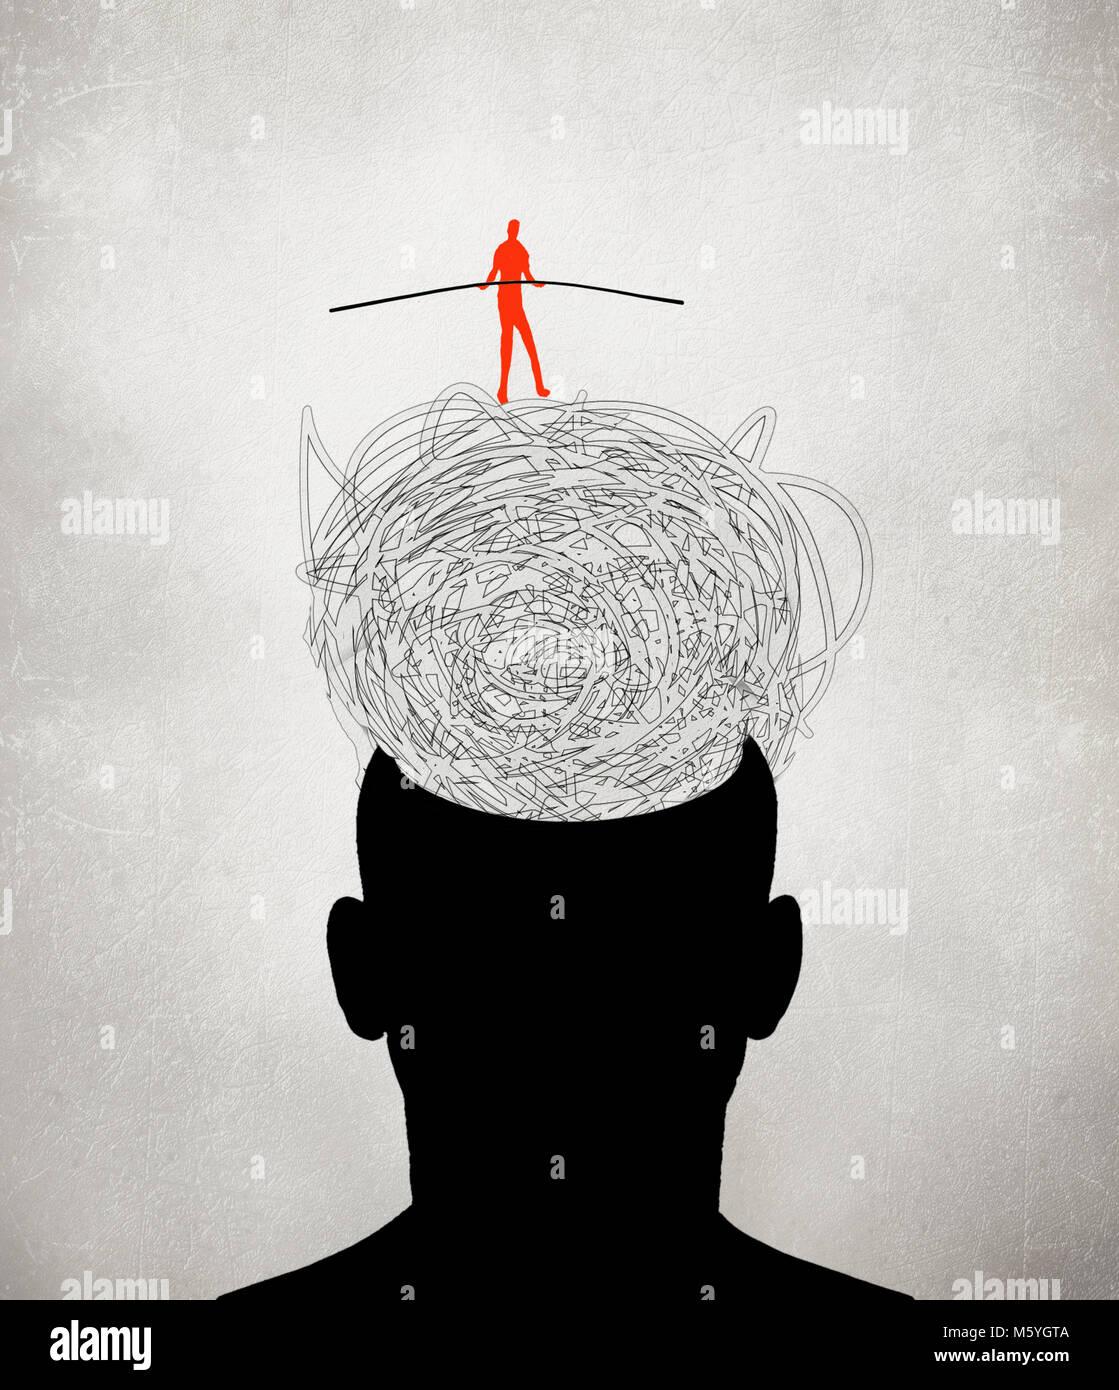 equilibrist walking on muddled thoughts digital illustration - Stock Image